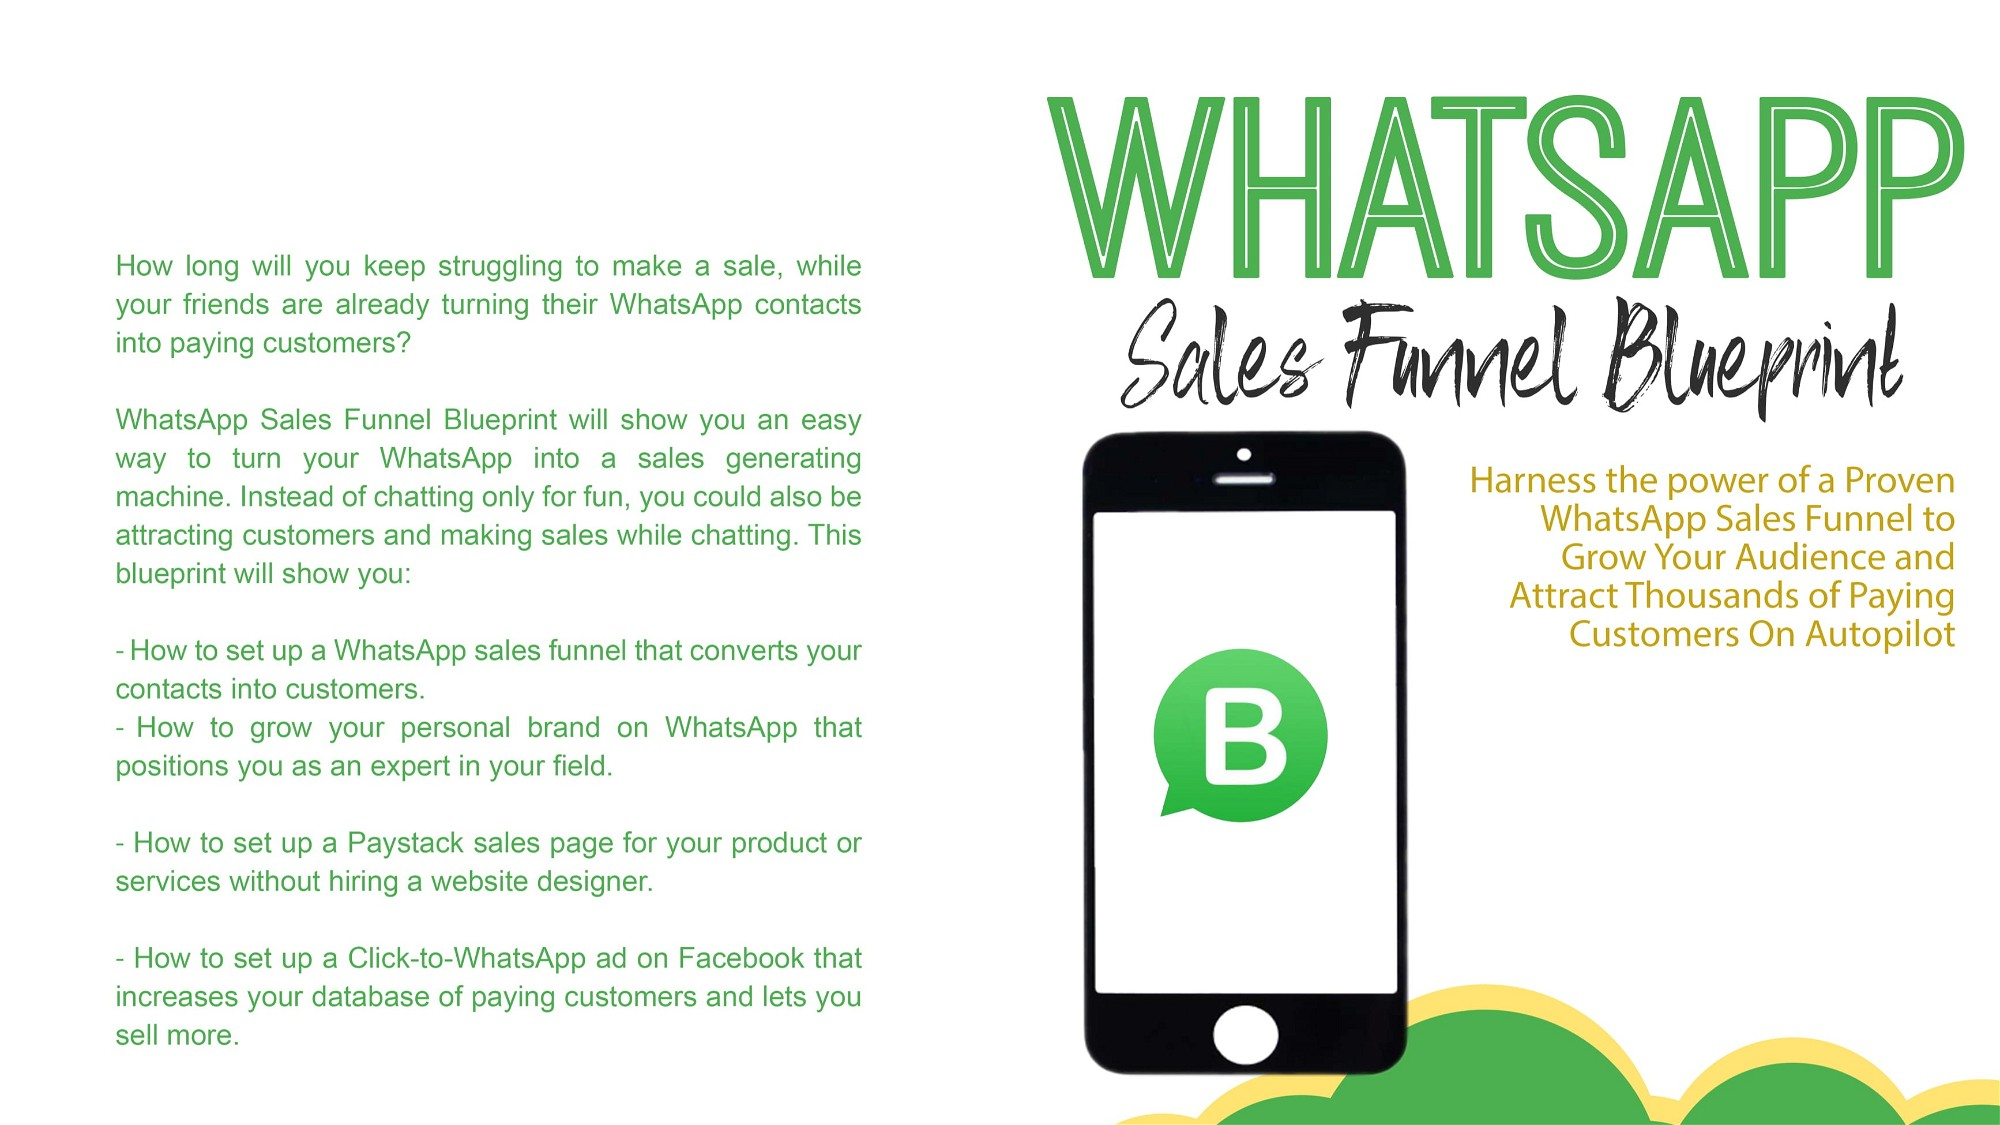 AppSumo Deal for WhatsApp Sales Funnel BluePrint